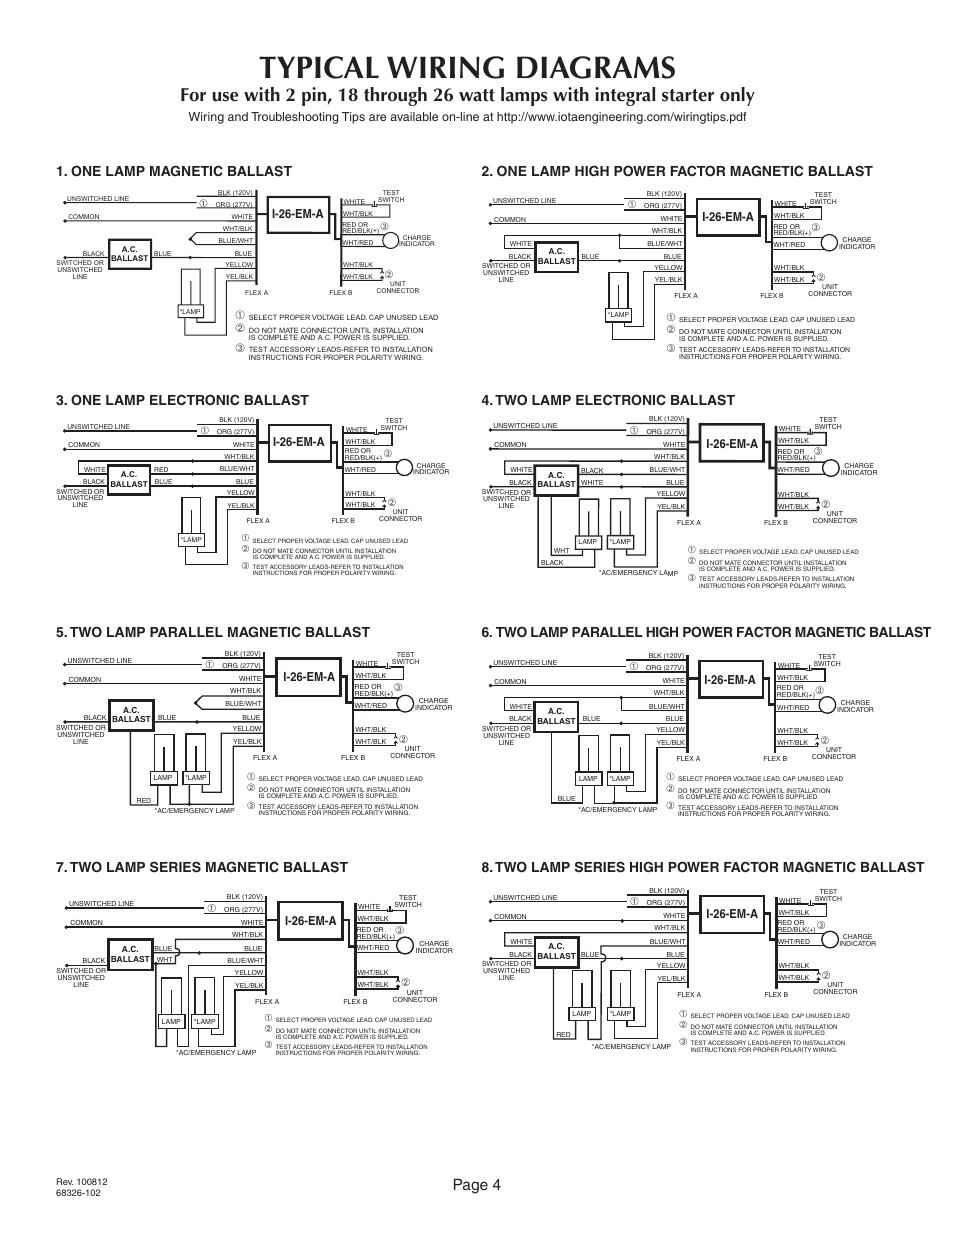 Unique Bodine Emergency Ballast Wiring Diagram Photos - Wiring ...